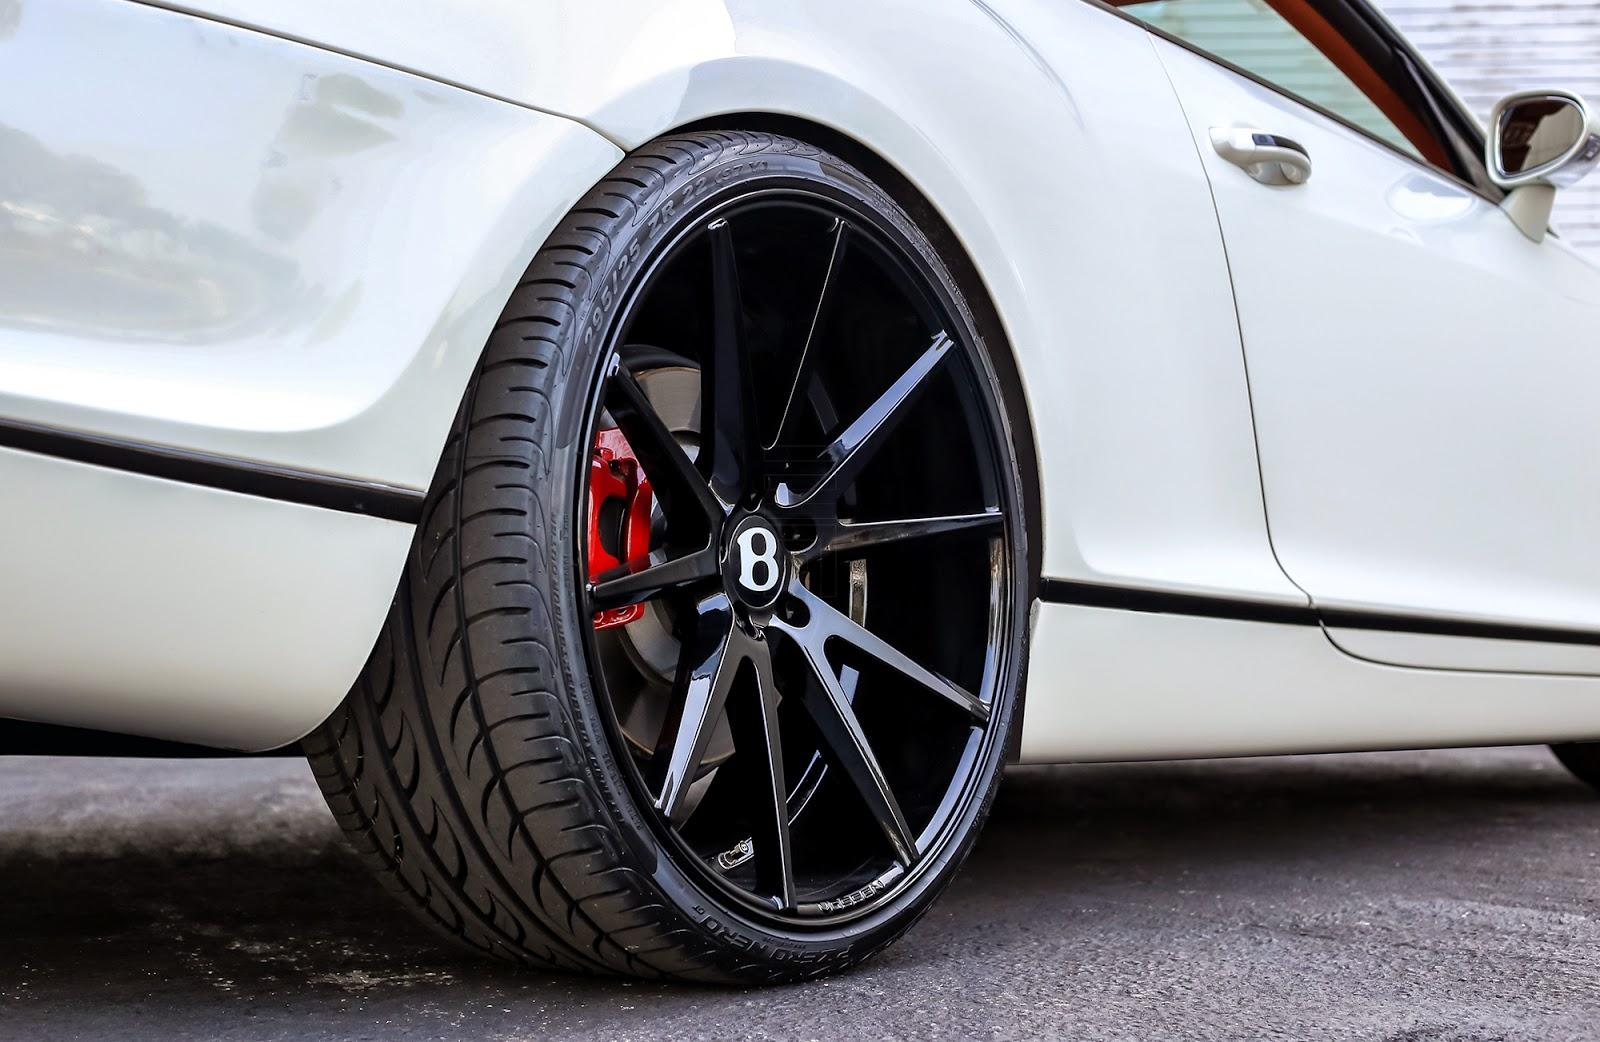 Vossen Vfs1 Alloy Wheels For Bentley Continental Gt